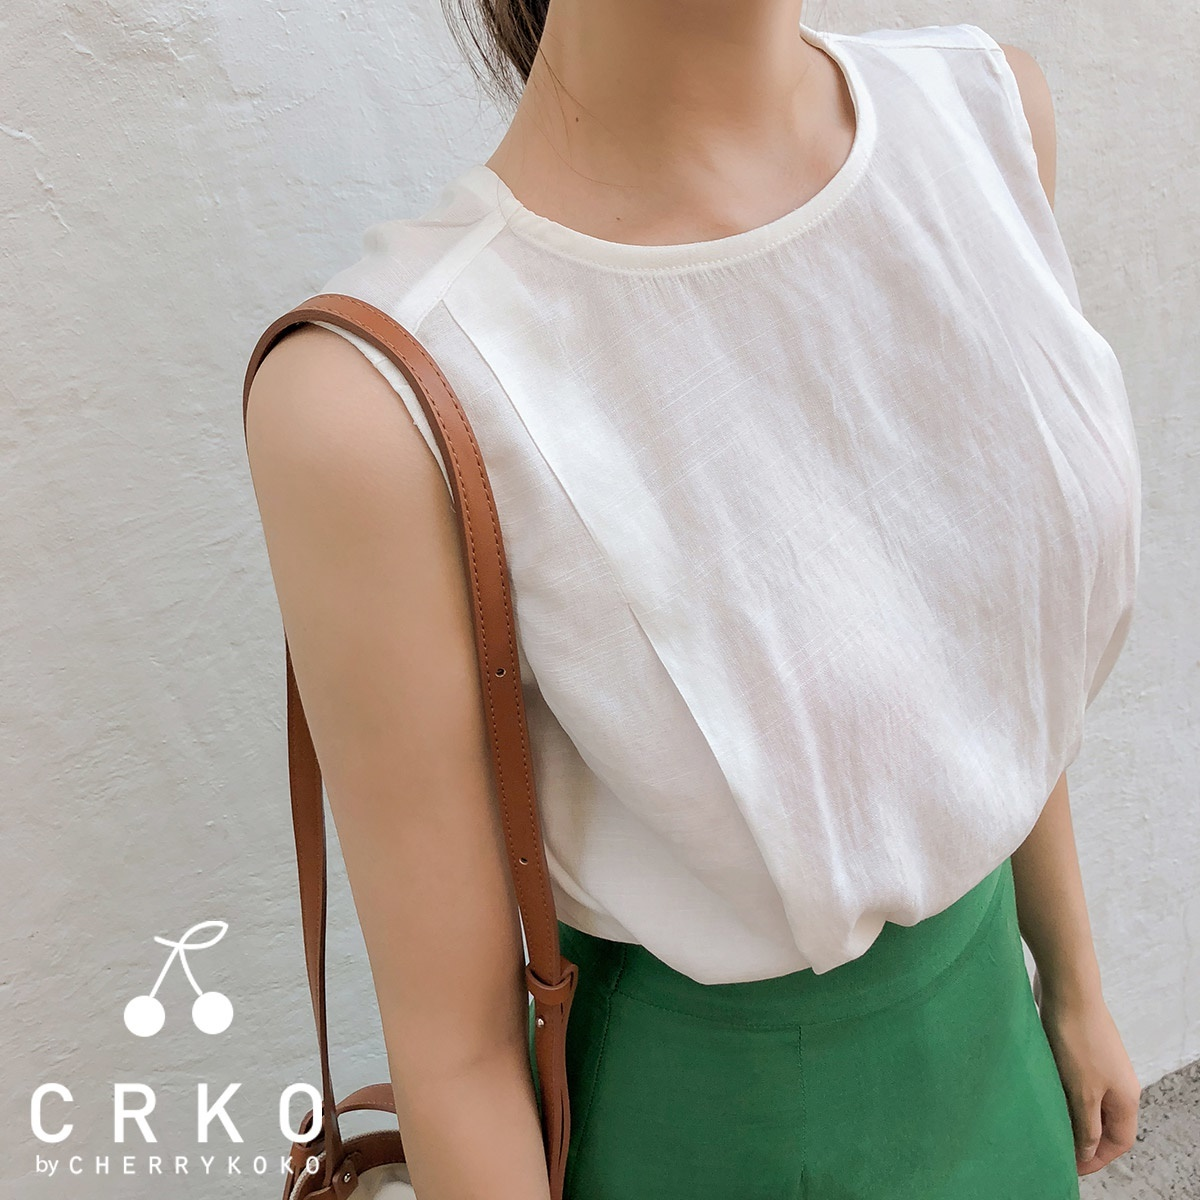 [CHERRYKOKO官方旗艦店] 圓領無袖襯衫 / second lovering blouse